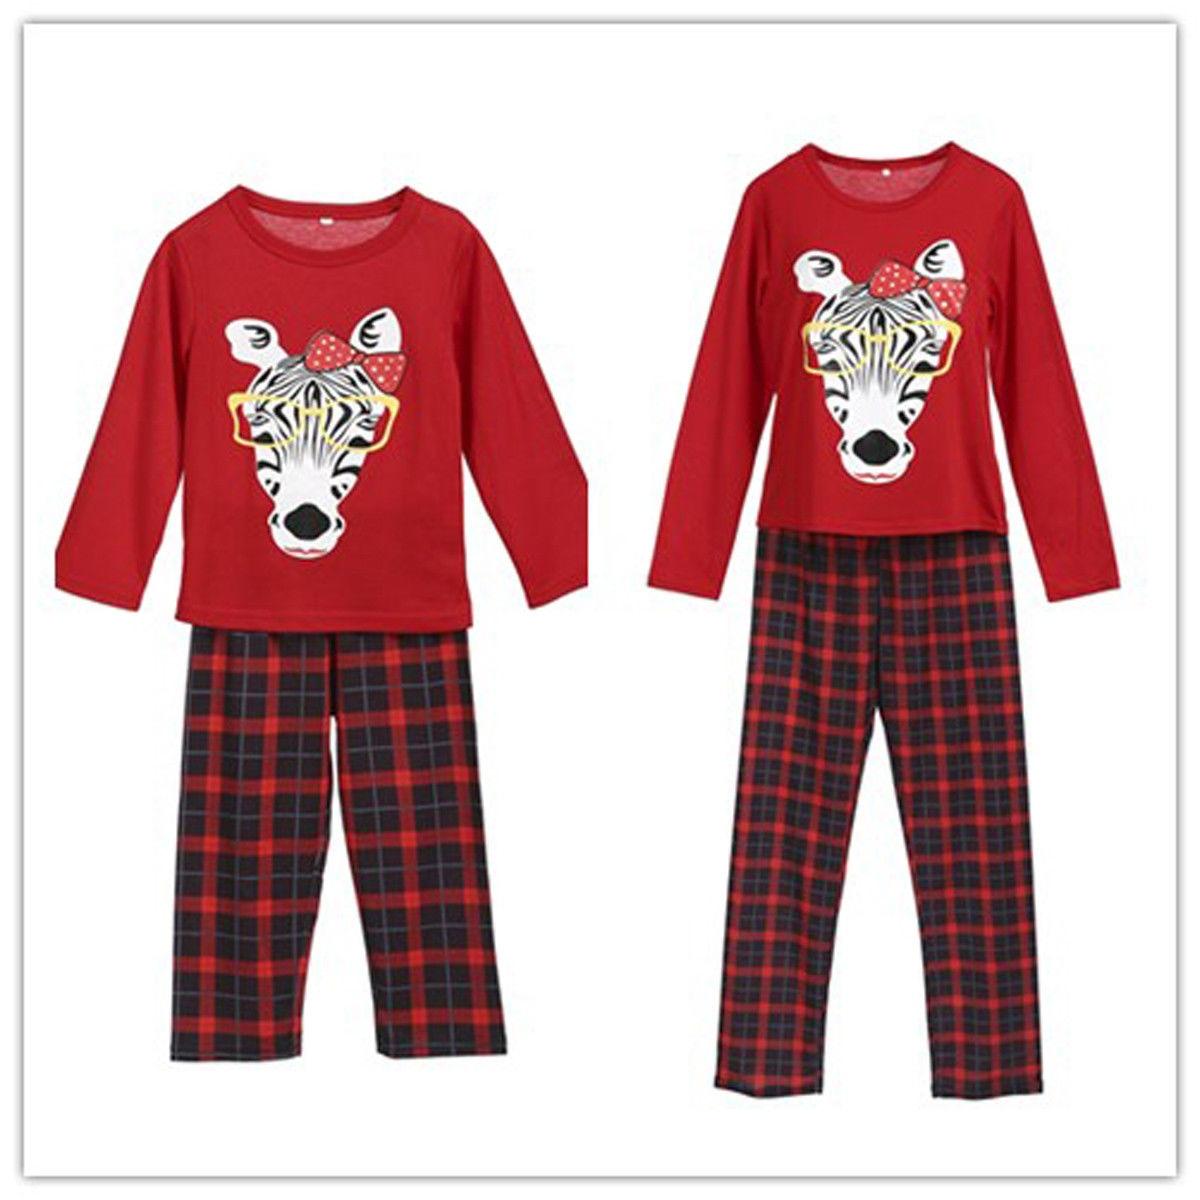 003b10812e Detail Feedback Questions about Xmas Family Pajamas Set Mom Kids Nightwear  Christmas Zebra Print Plaid pants PJ s Sleepwear on Aliexpress.com